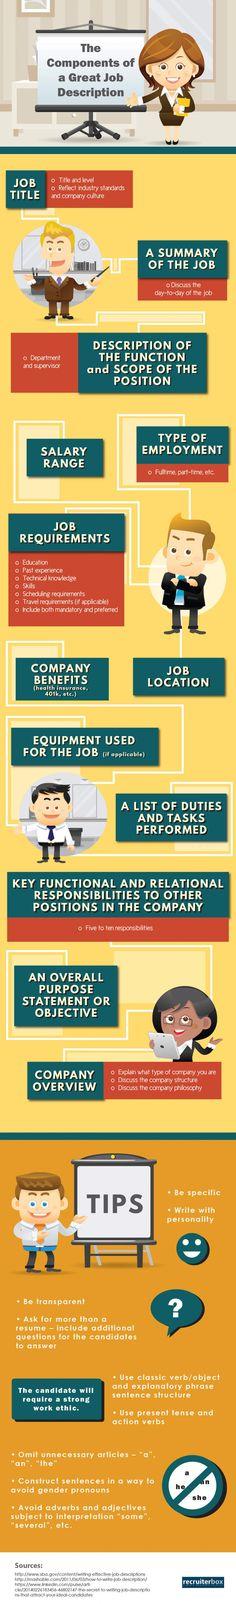 4 Tricks Tech Companies Use To Poach Software Programmers - programmer job description